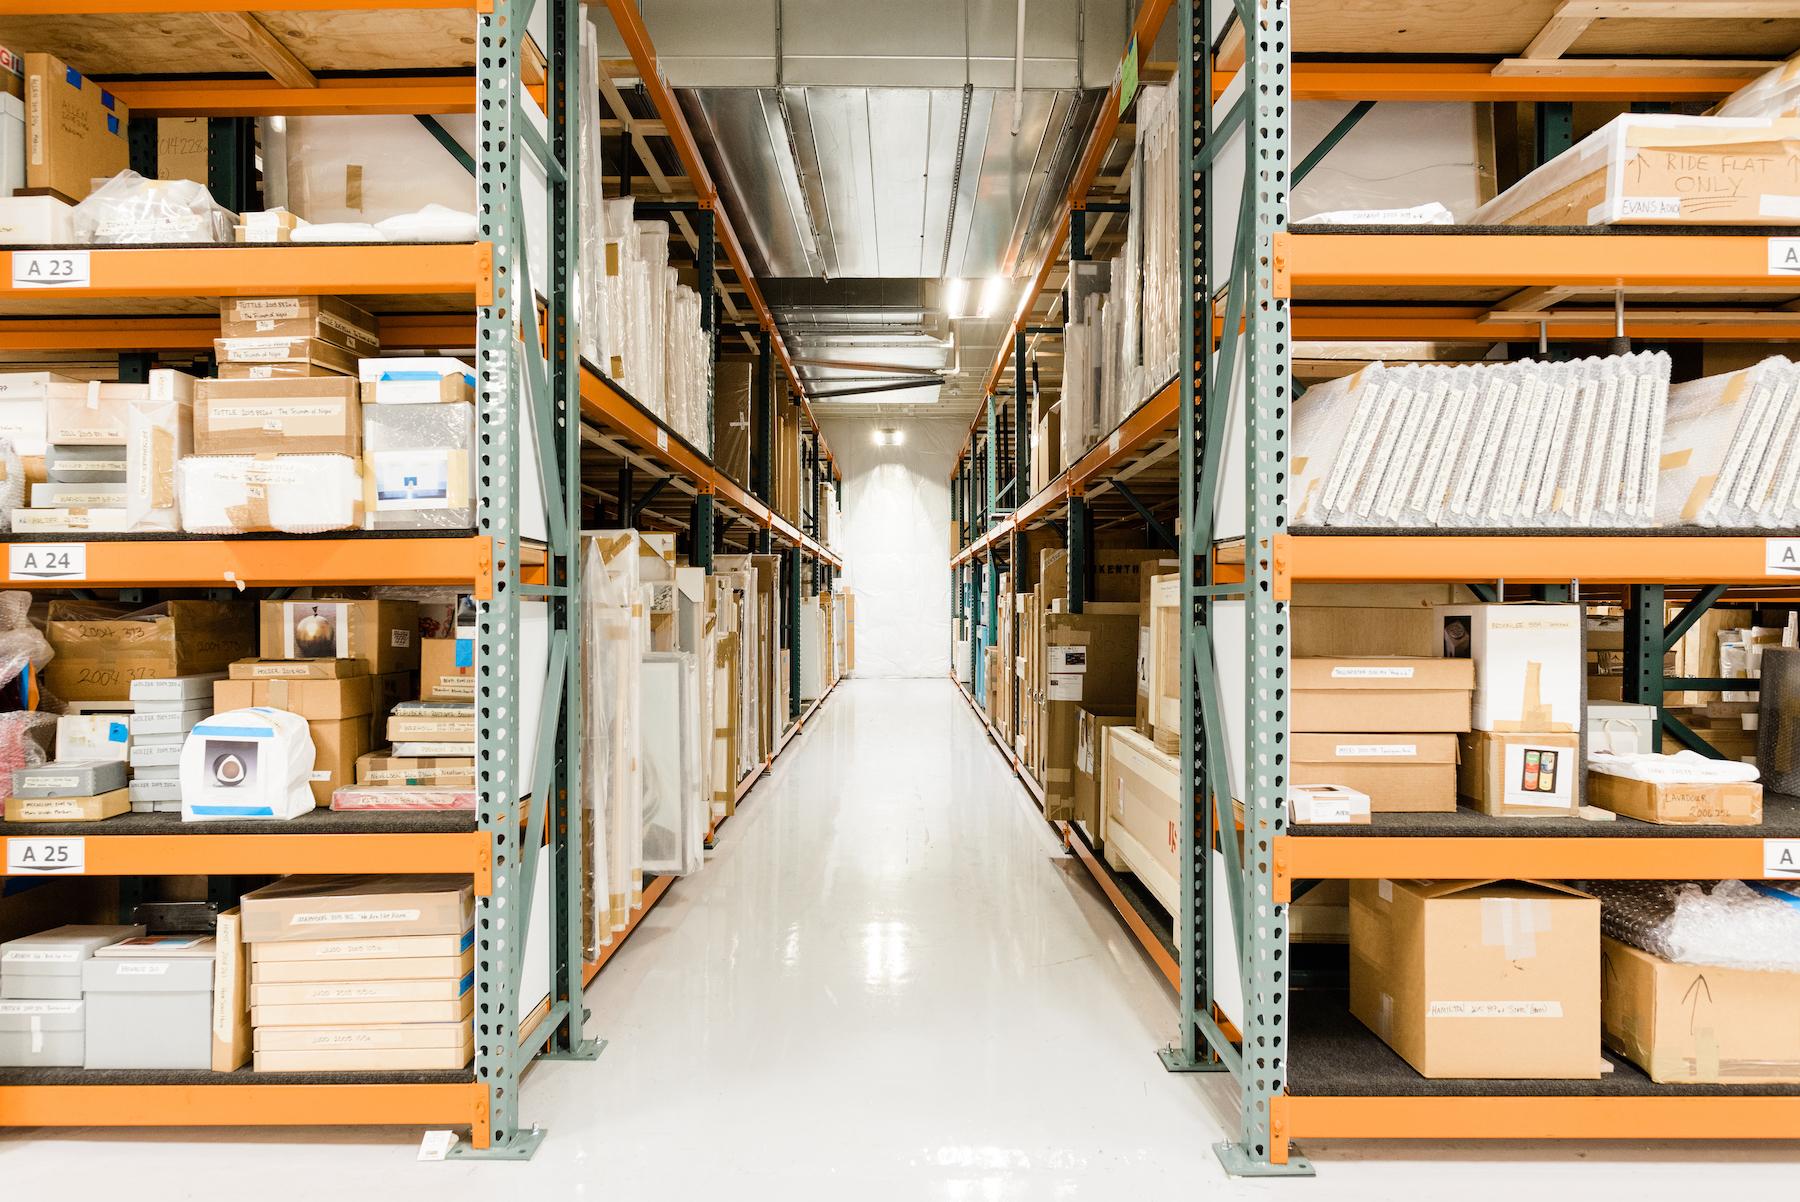 Jordan Schnitzer's art warehouse